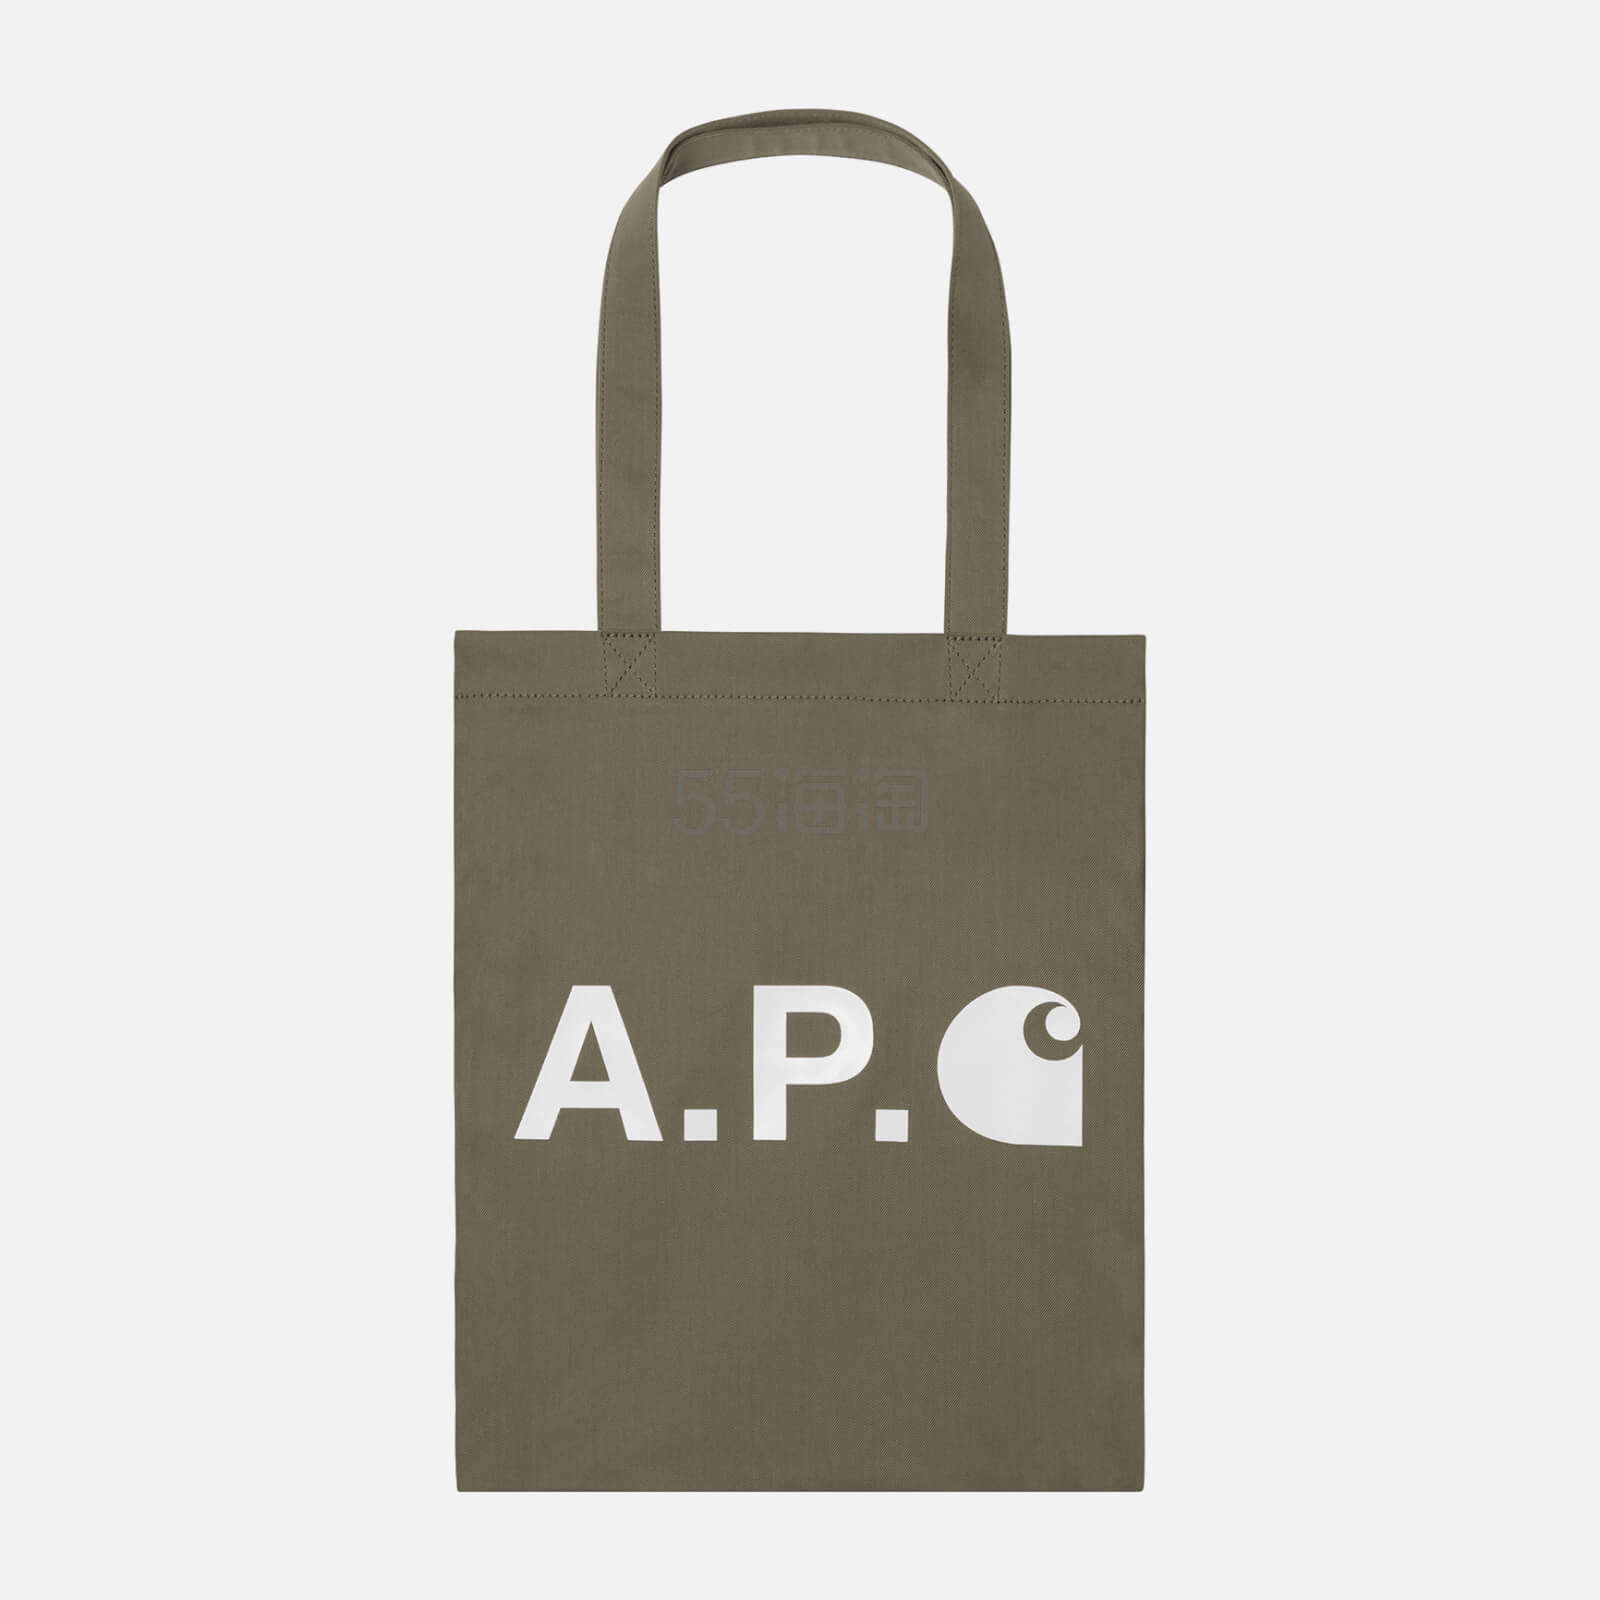 A.P.C. X Carhartt 帆布托特袋 ¥681.12 - 海淘优惠海淘折扣|55海淘网